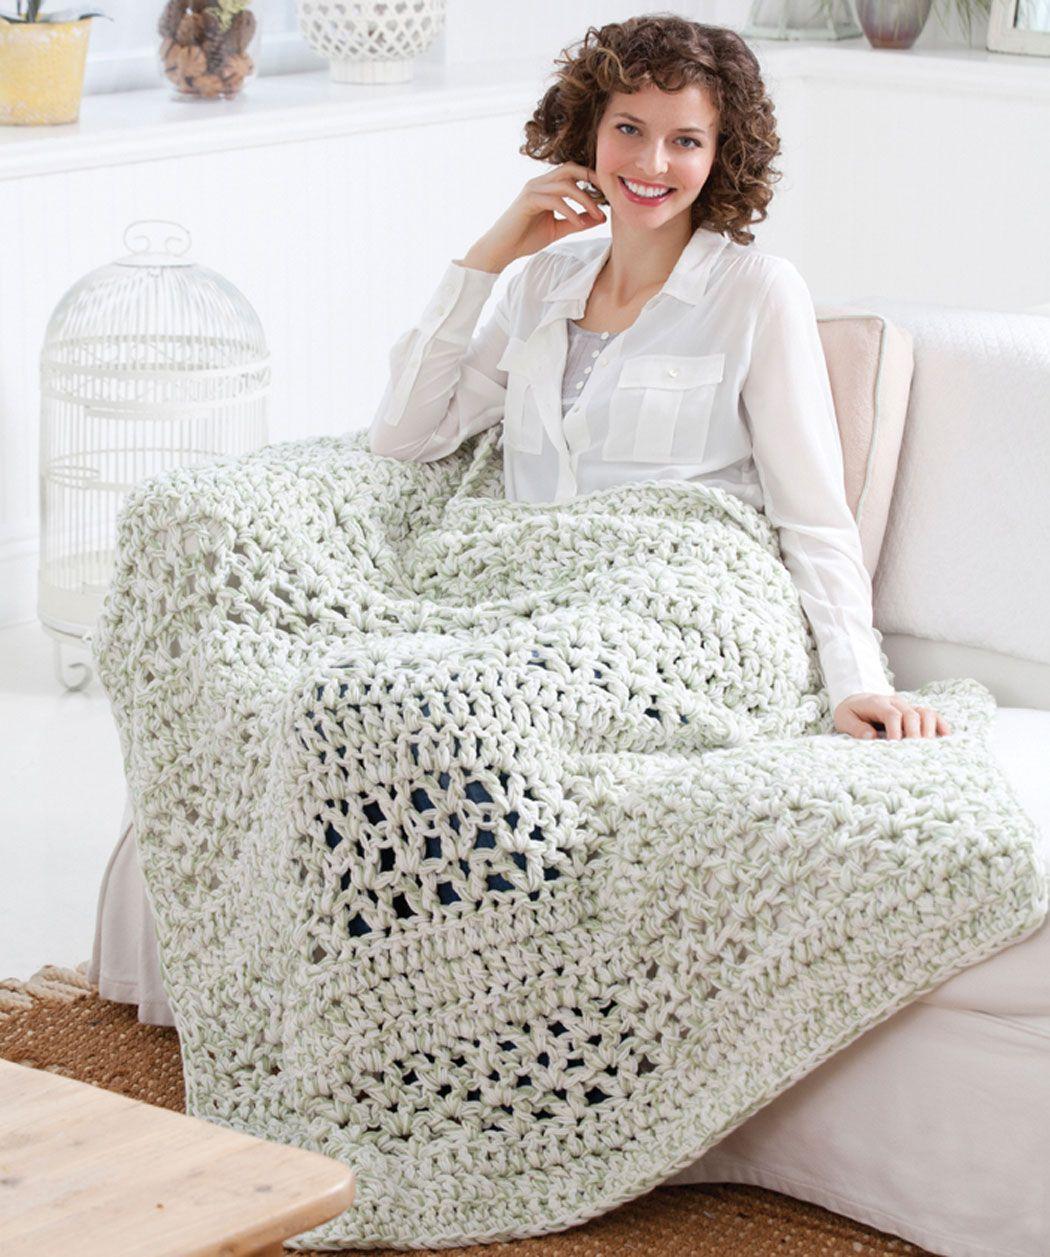 Pin by Cathy Cunningham on Crochet Afghans   Pinterest   Crochet ...